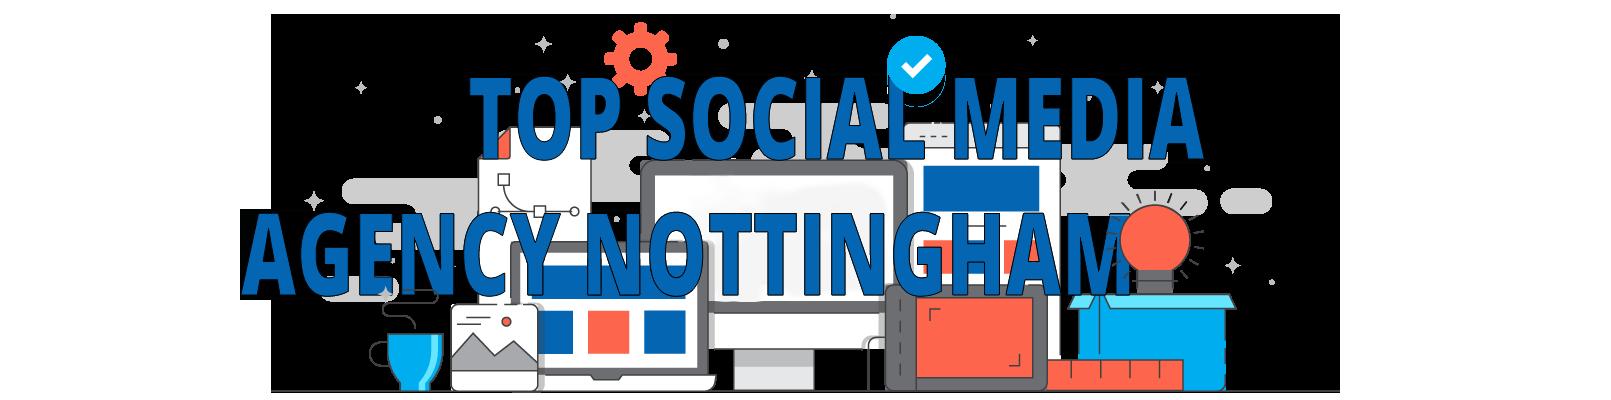 Top-Social-Media-Agency-Nottingham